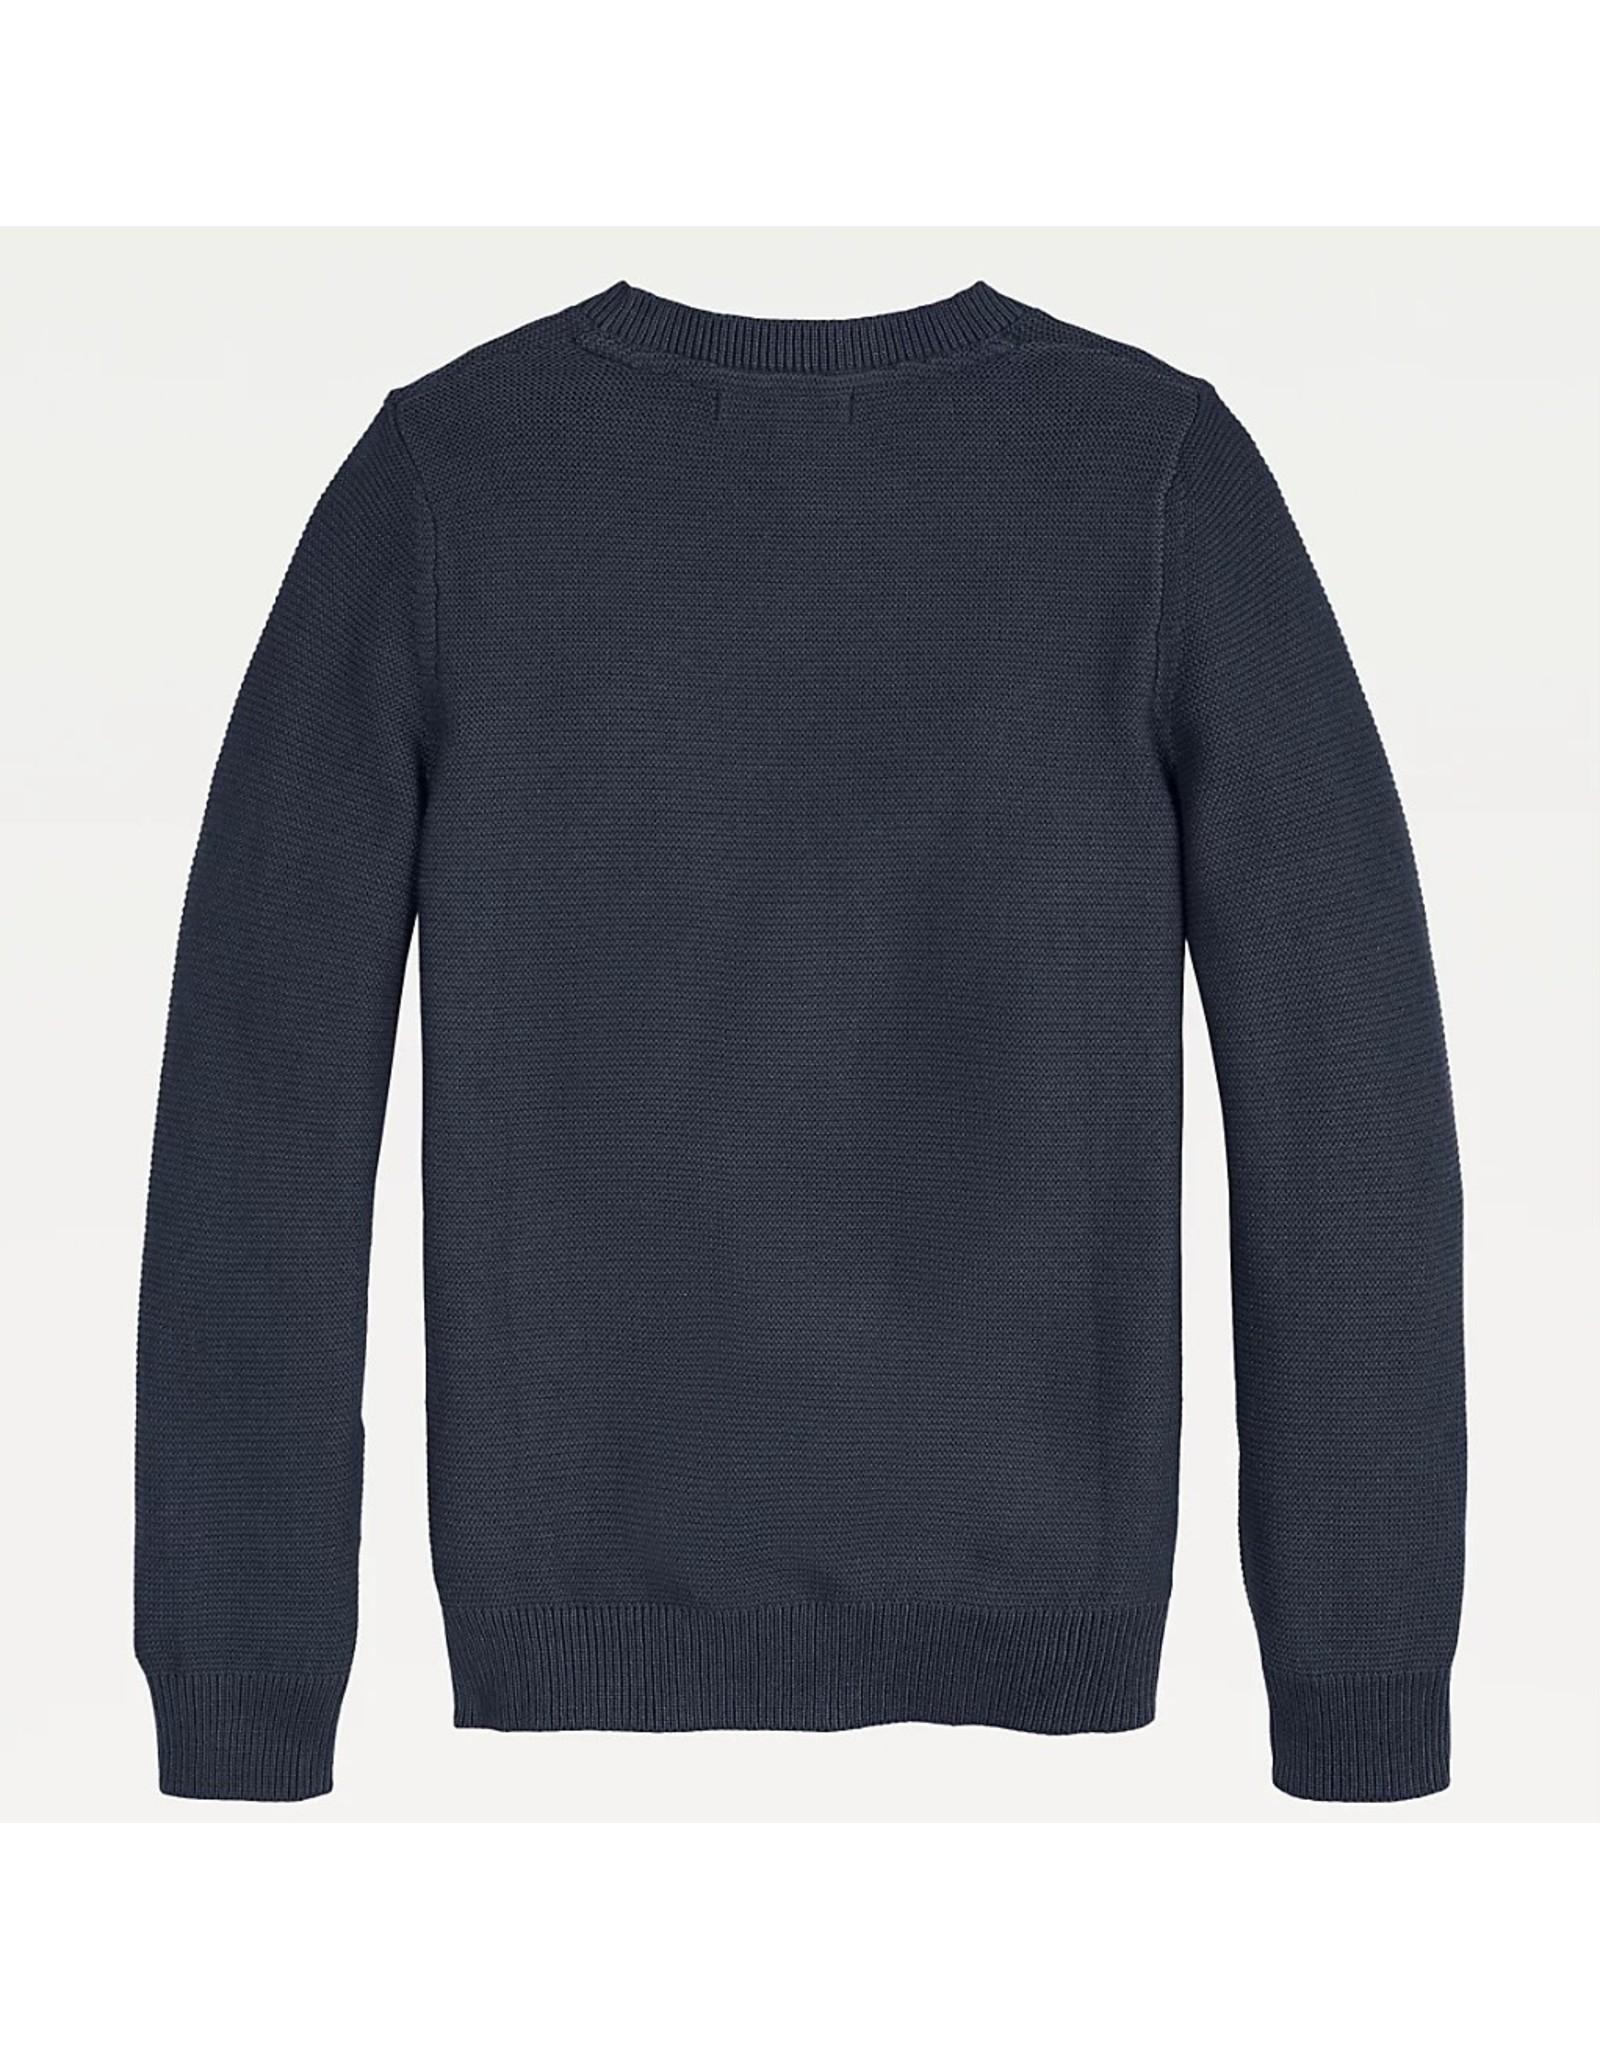 Tommy Hilfiger 6932 Sweater